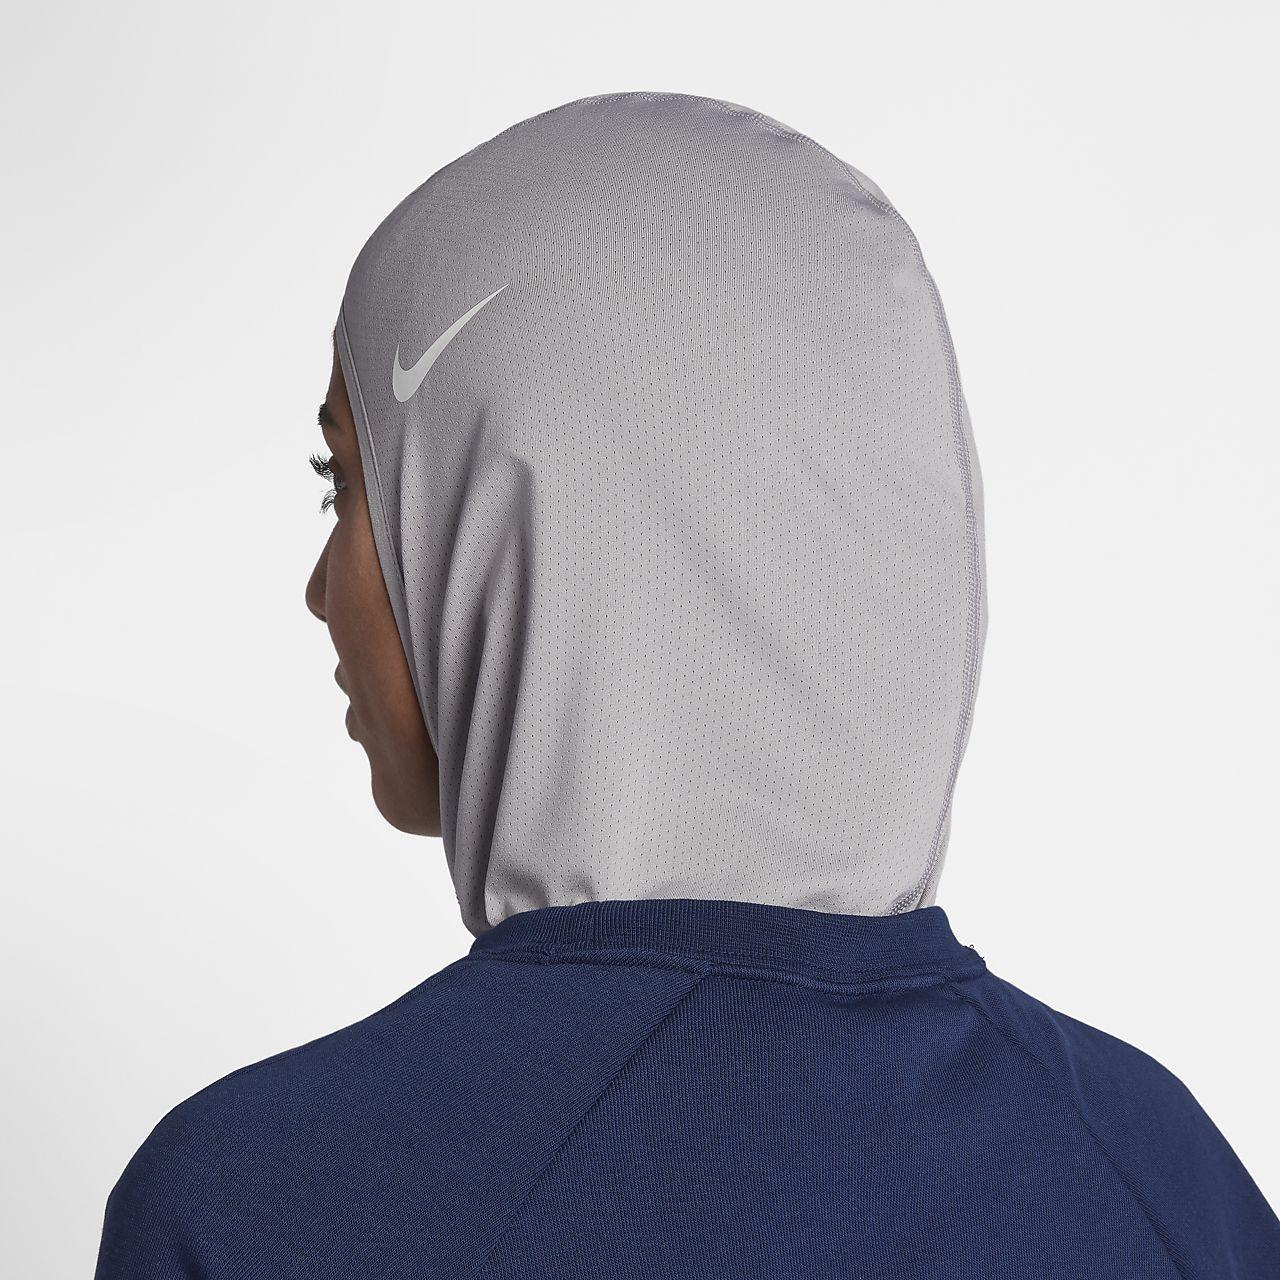 hot sale online a9389 e29c5 Nike Pro Women s Hijab. Nike.com GB